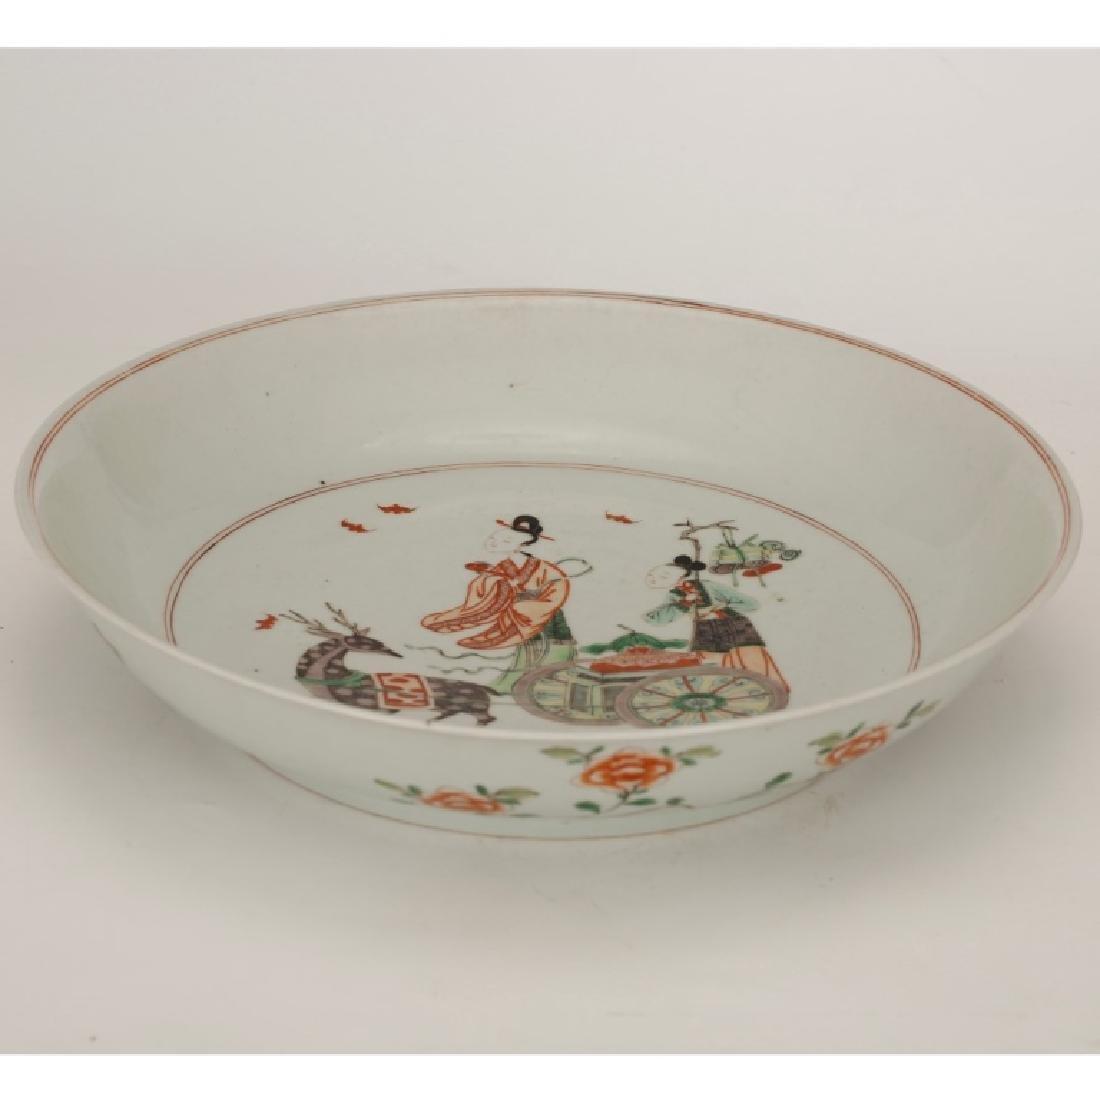 Chinese Qing Porcelain Famille Verte Plate